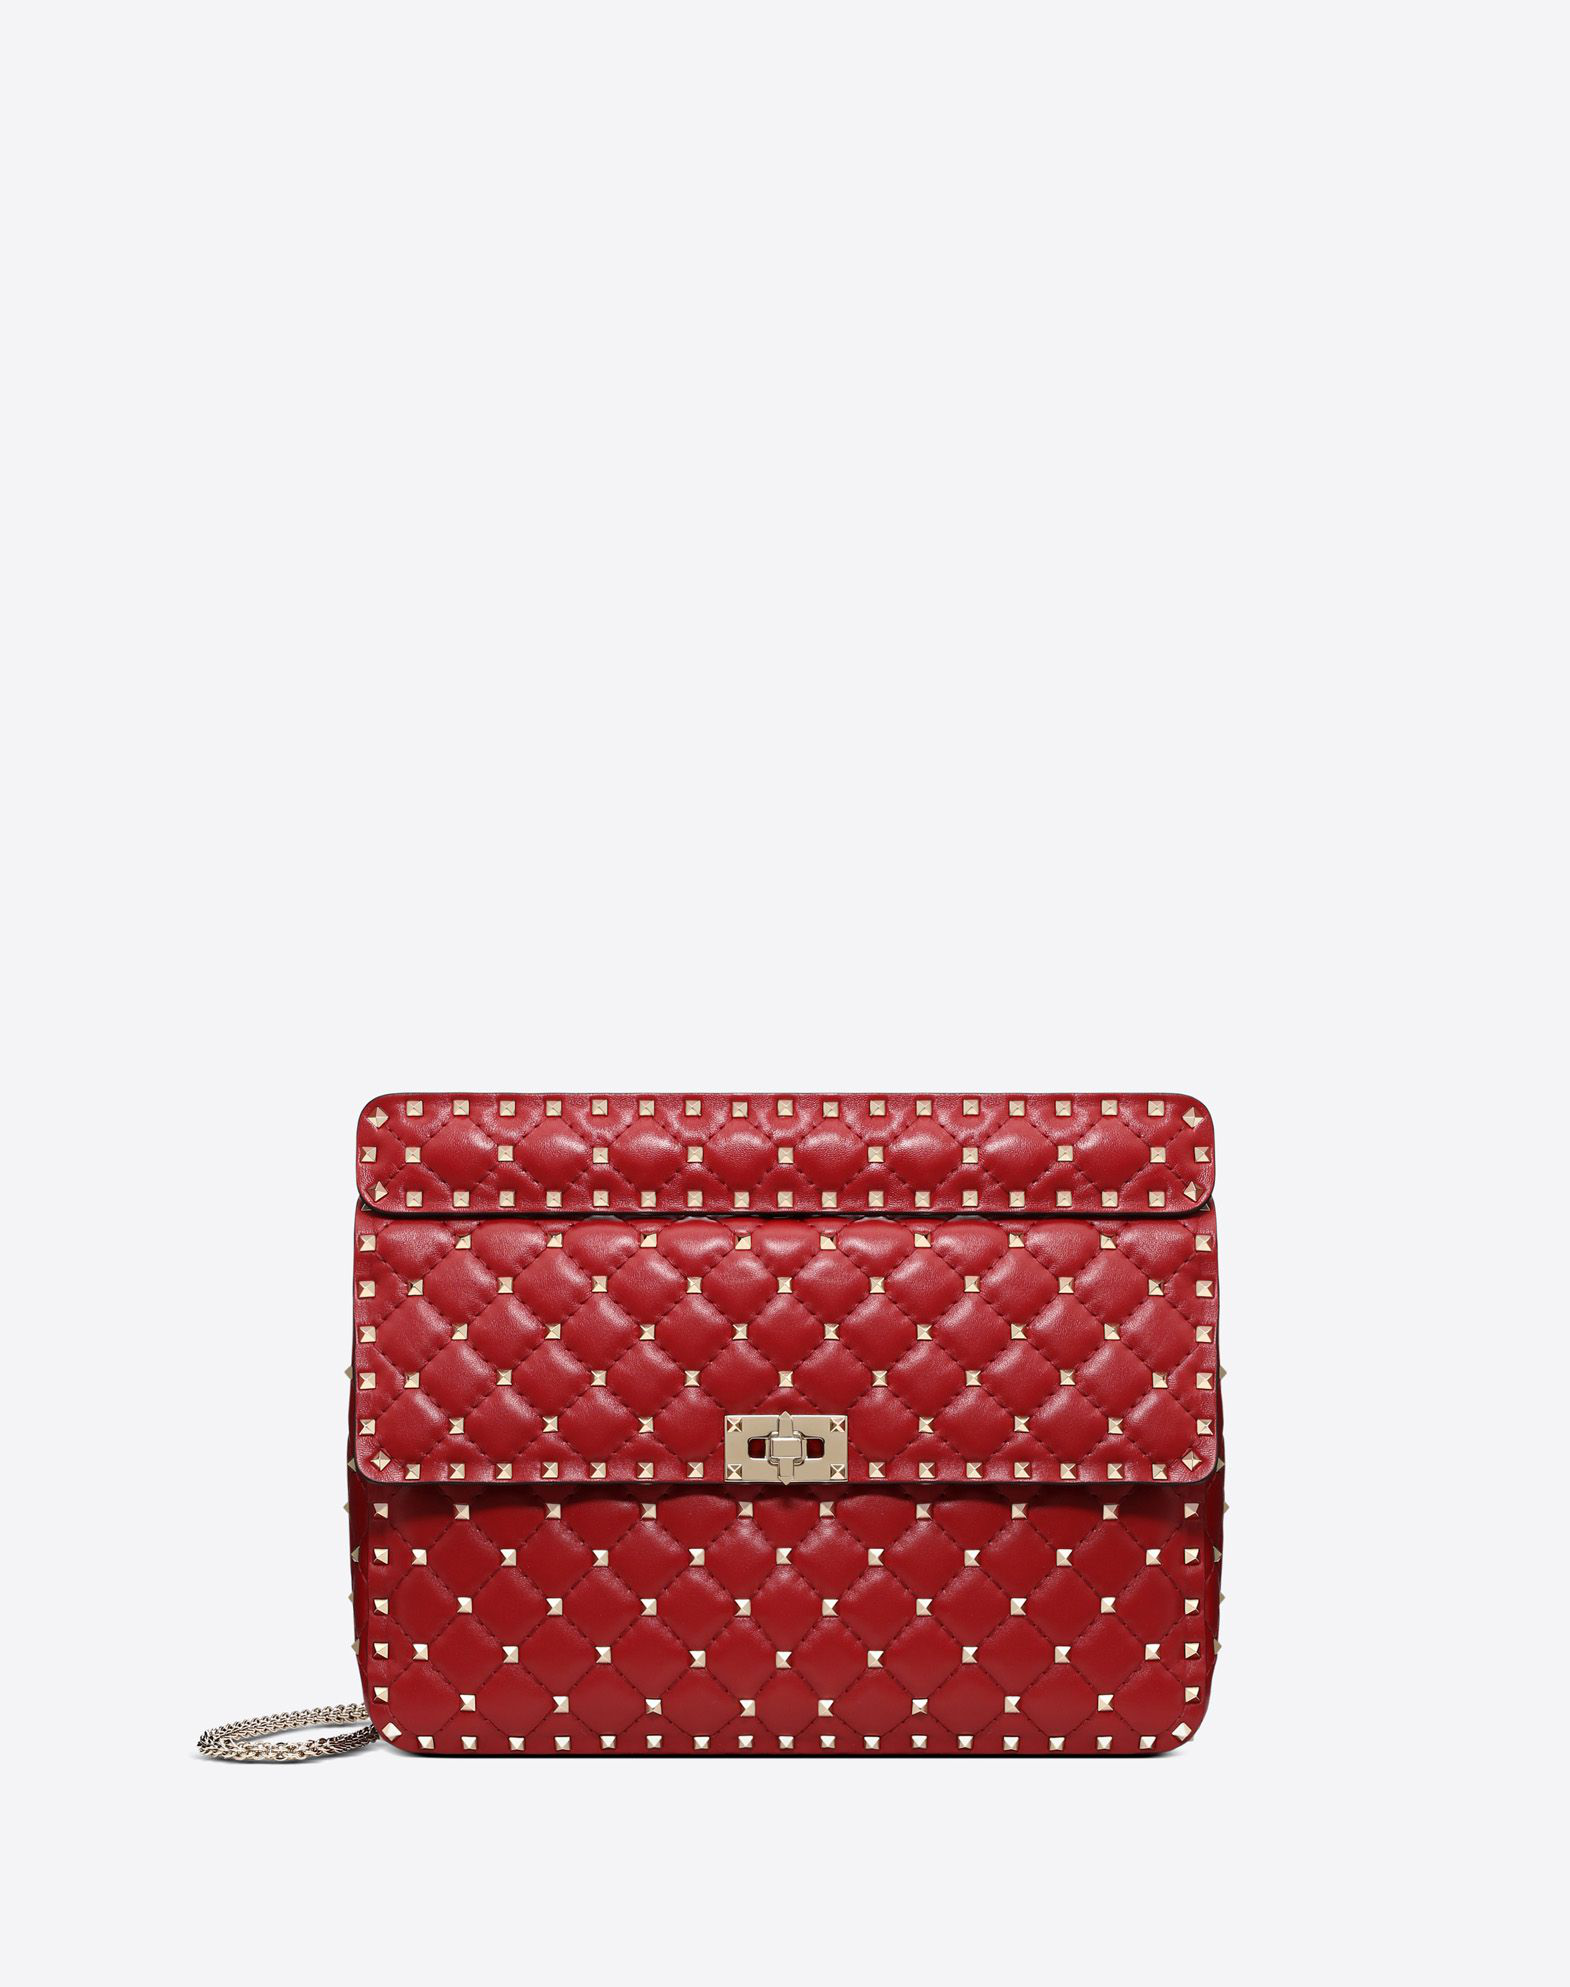 91e43ef2b43 Valentino Free Rockstud Spike Medium Chain Bag In Red